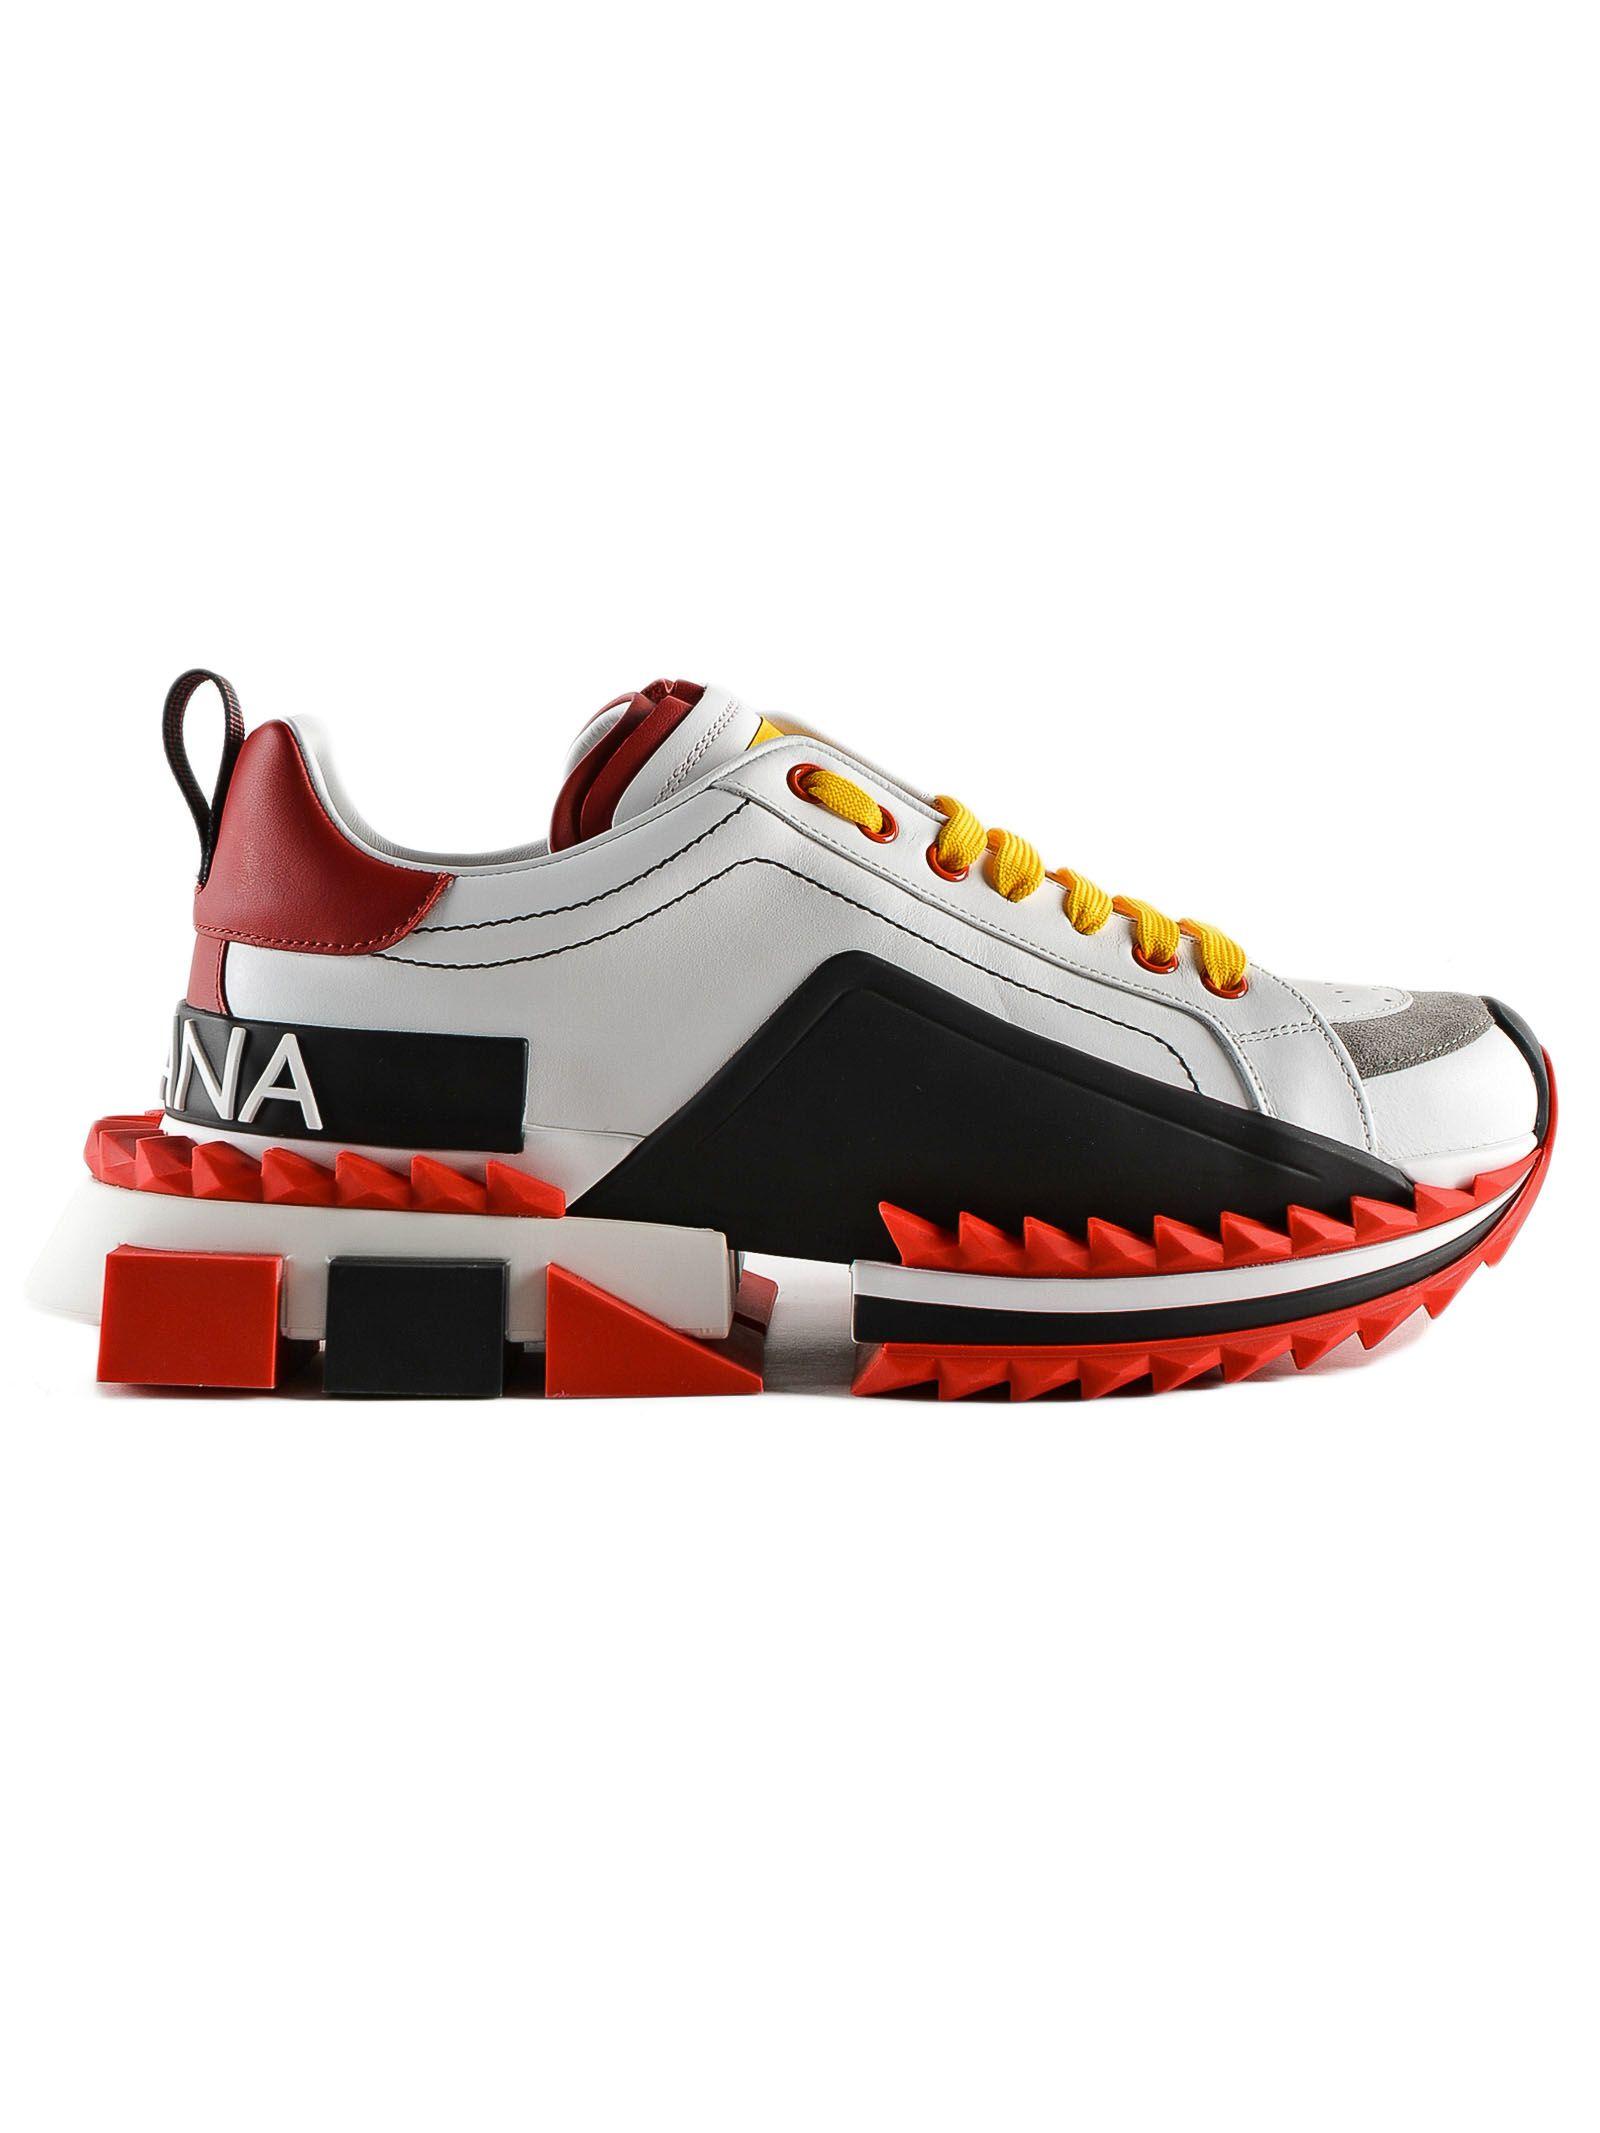 Dolce & Gabbana Ridged Sneakers